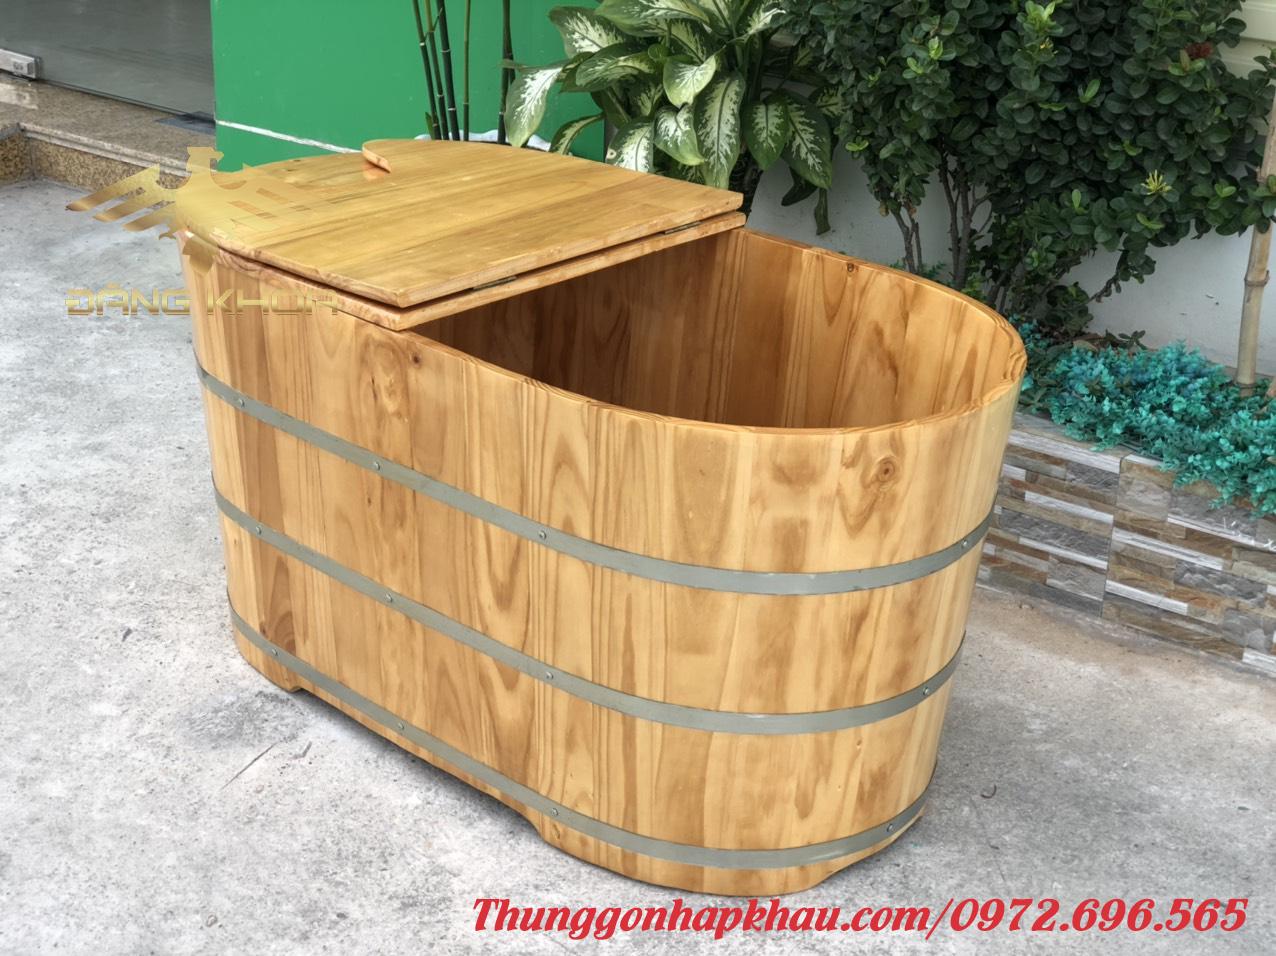 Bồn tắm gỗ đẹp